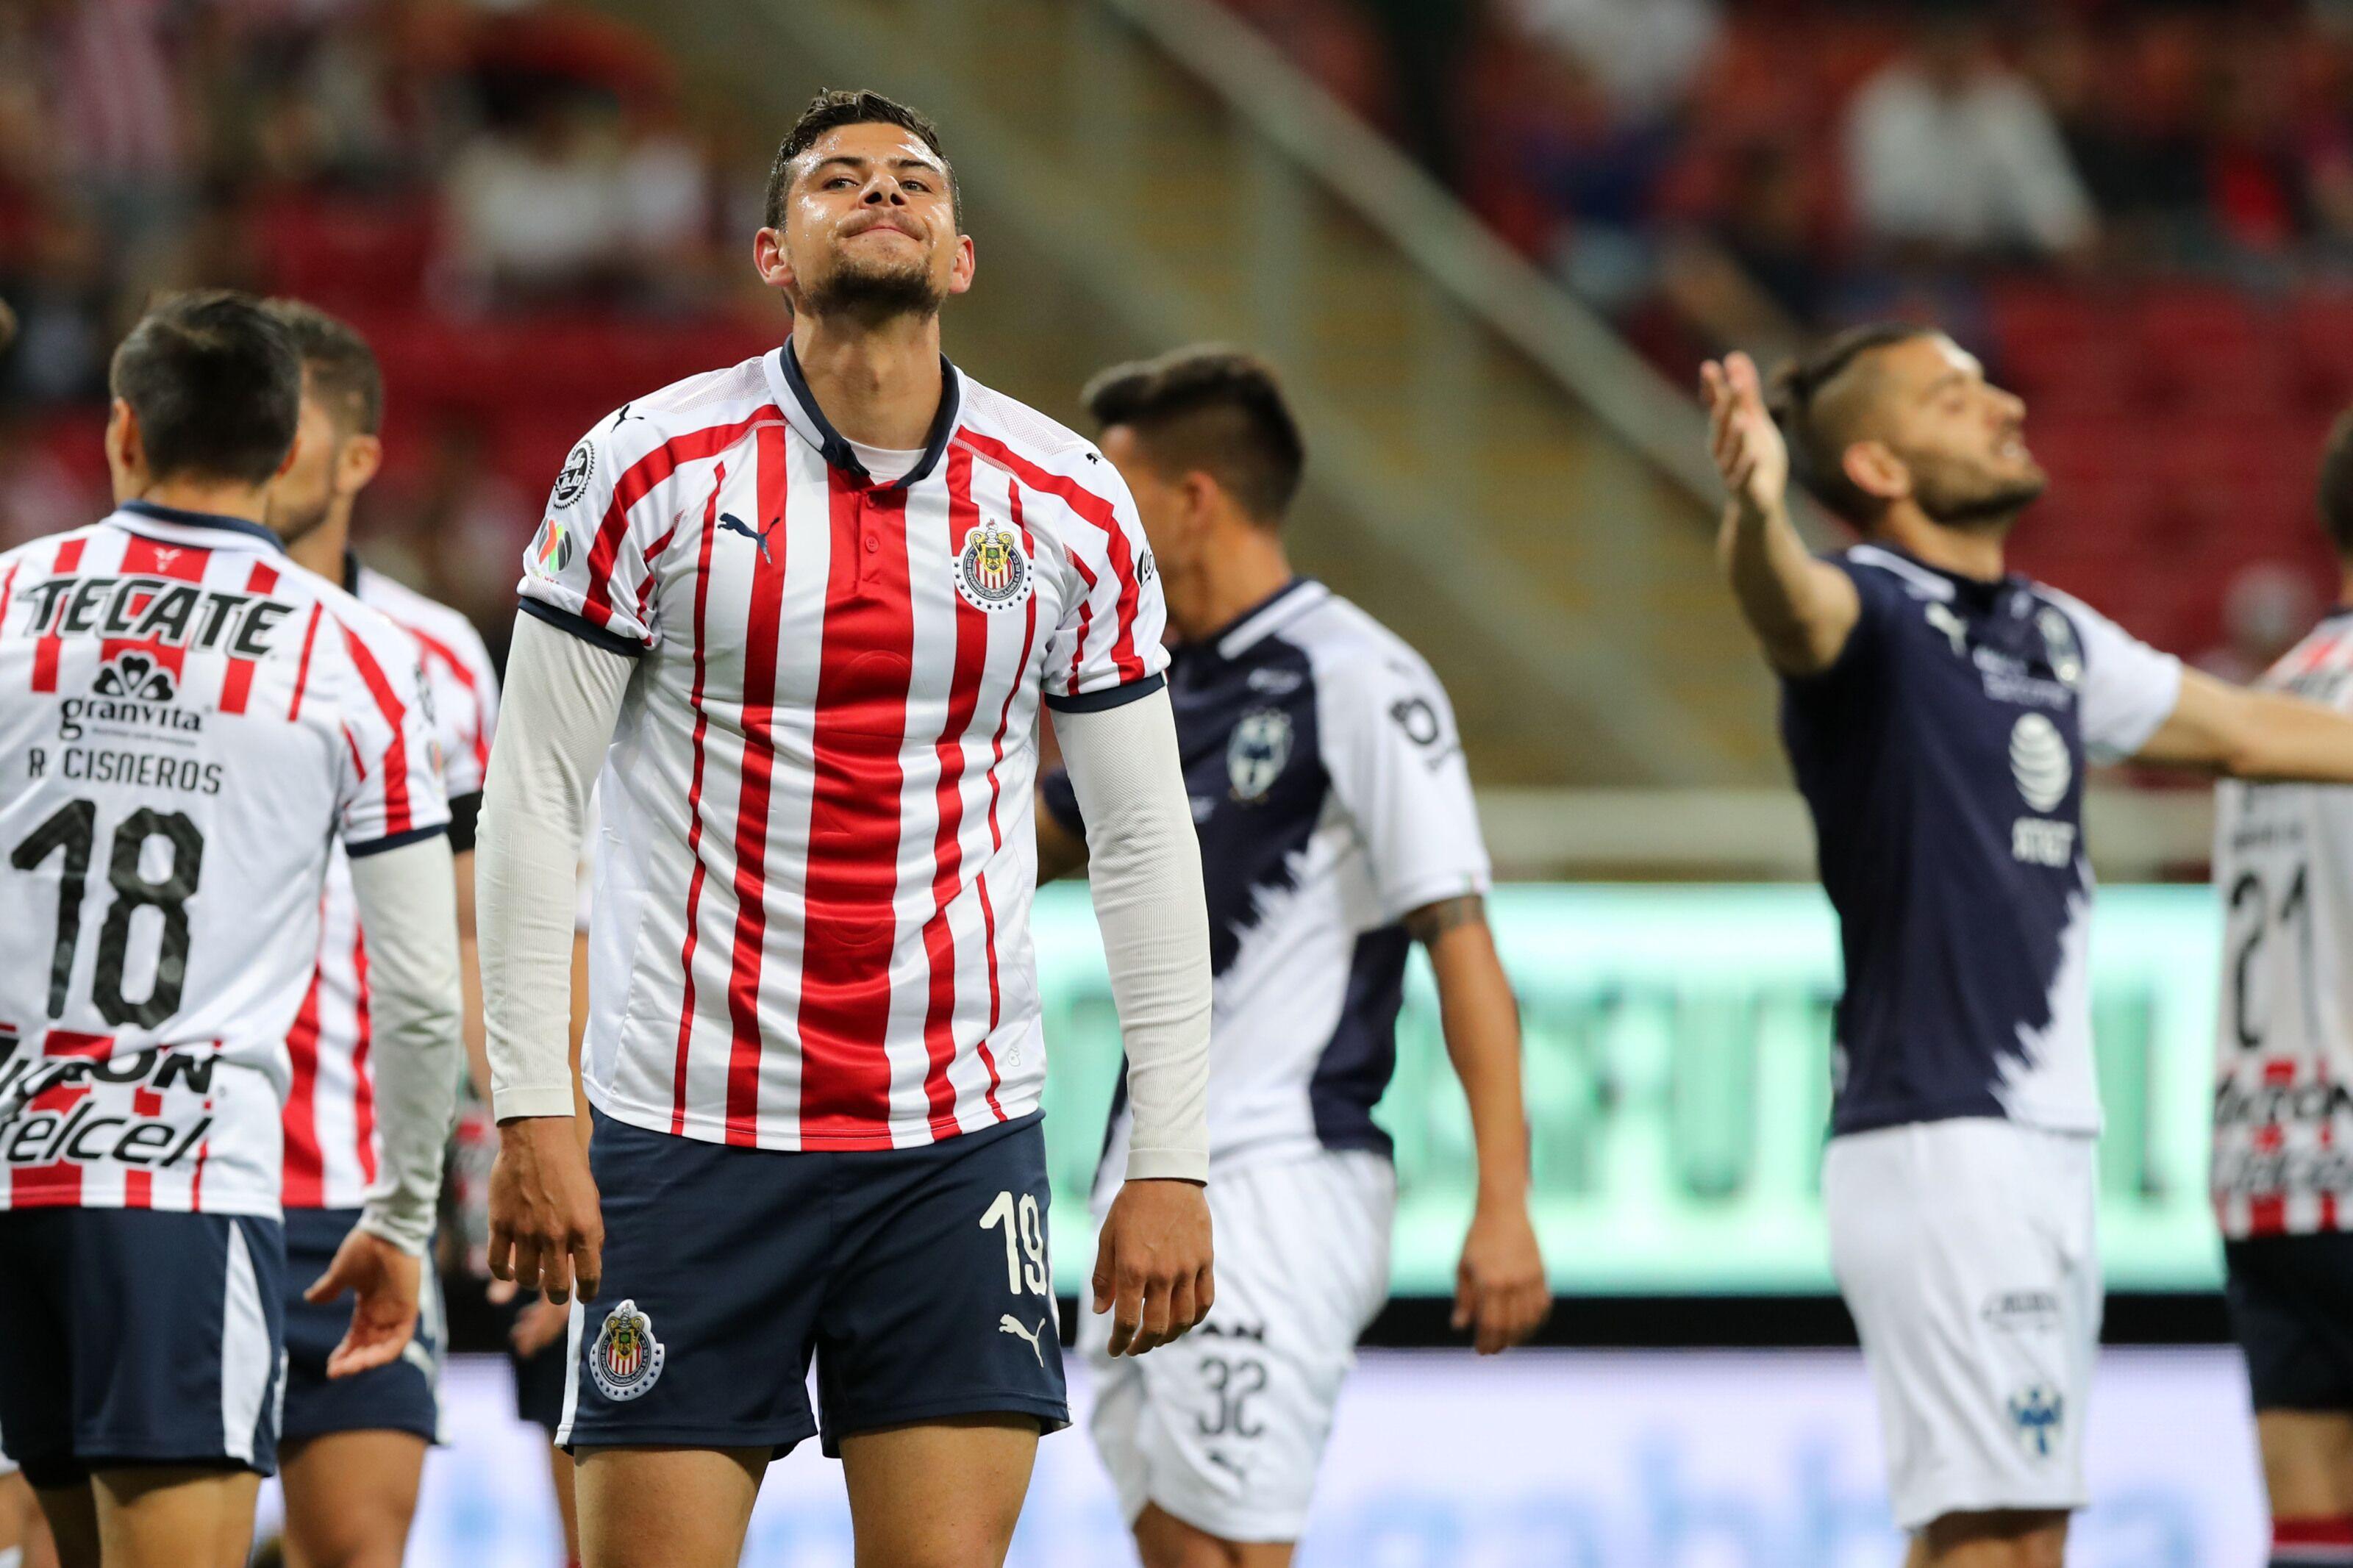 Their fortunes fading, slumping Chivas visit sinking Pumas